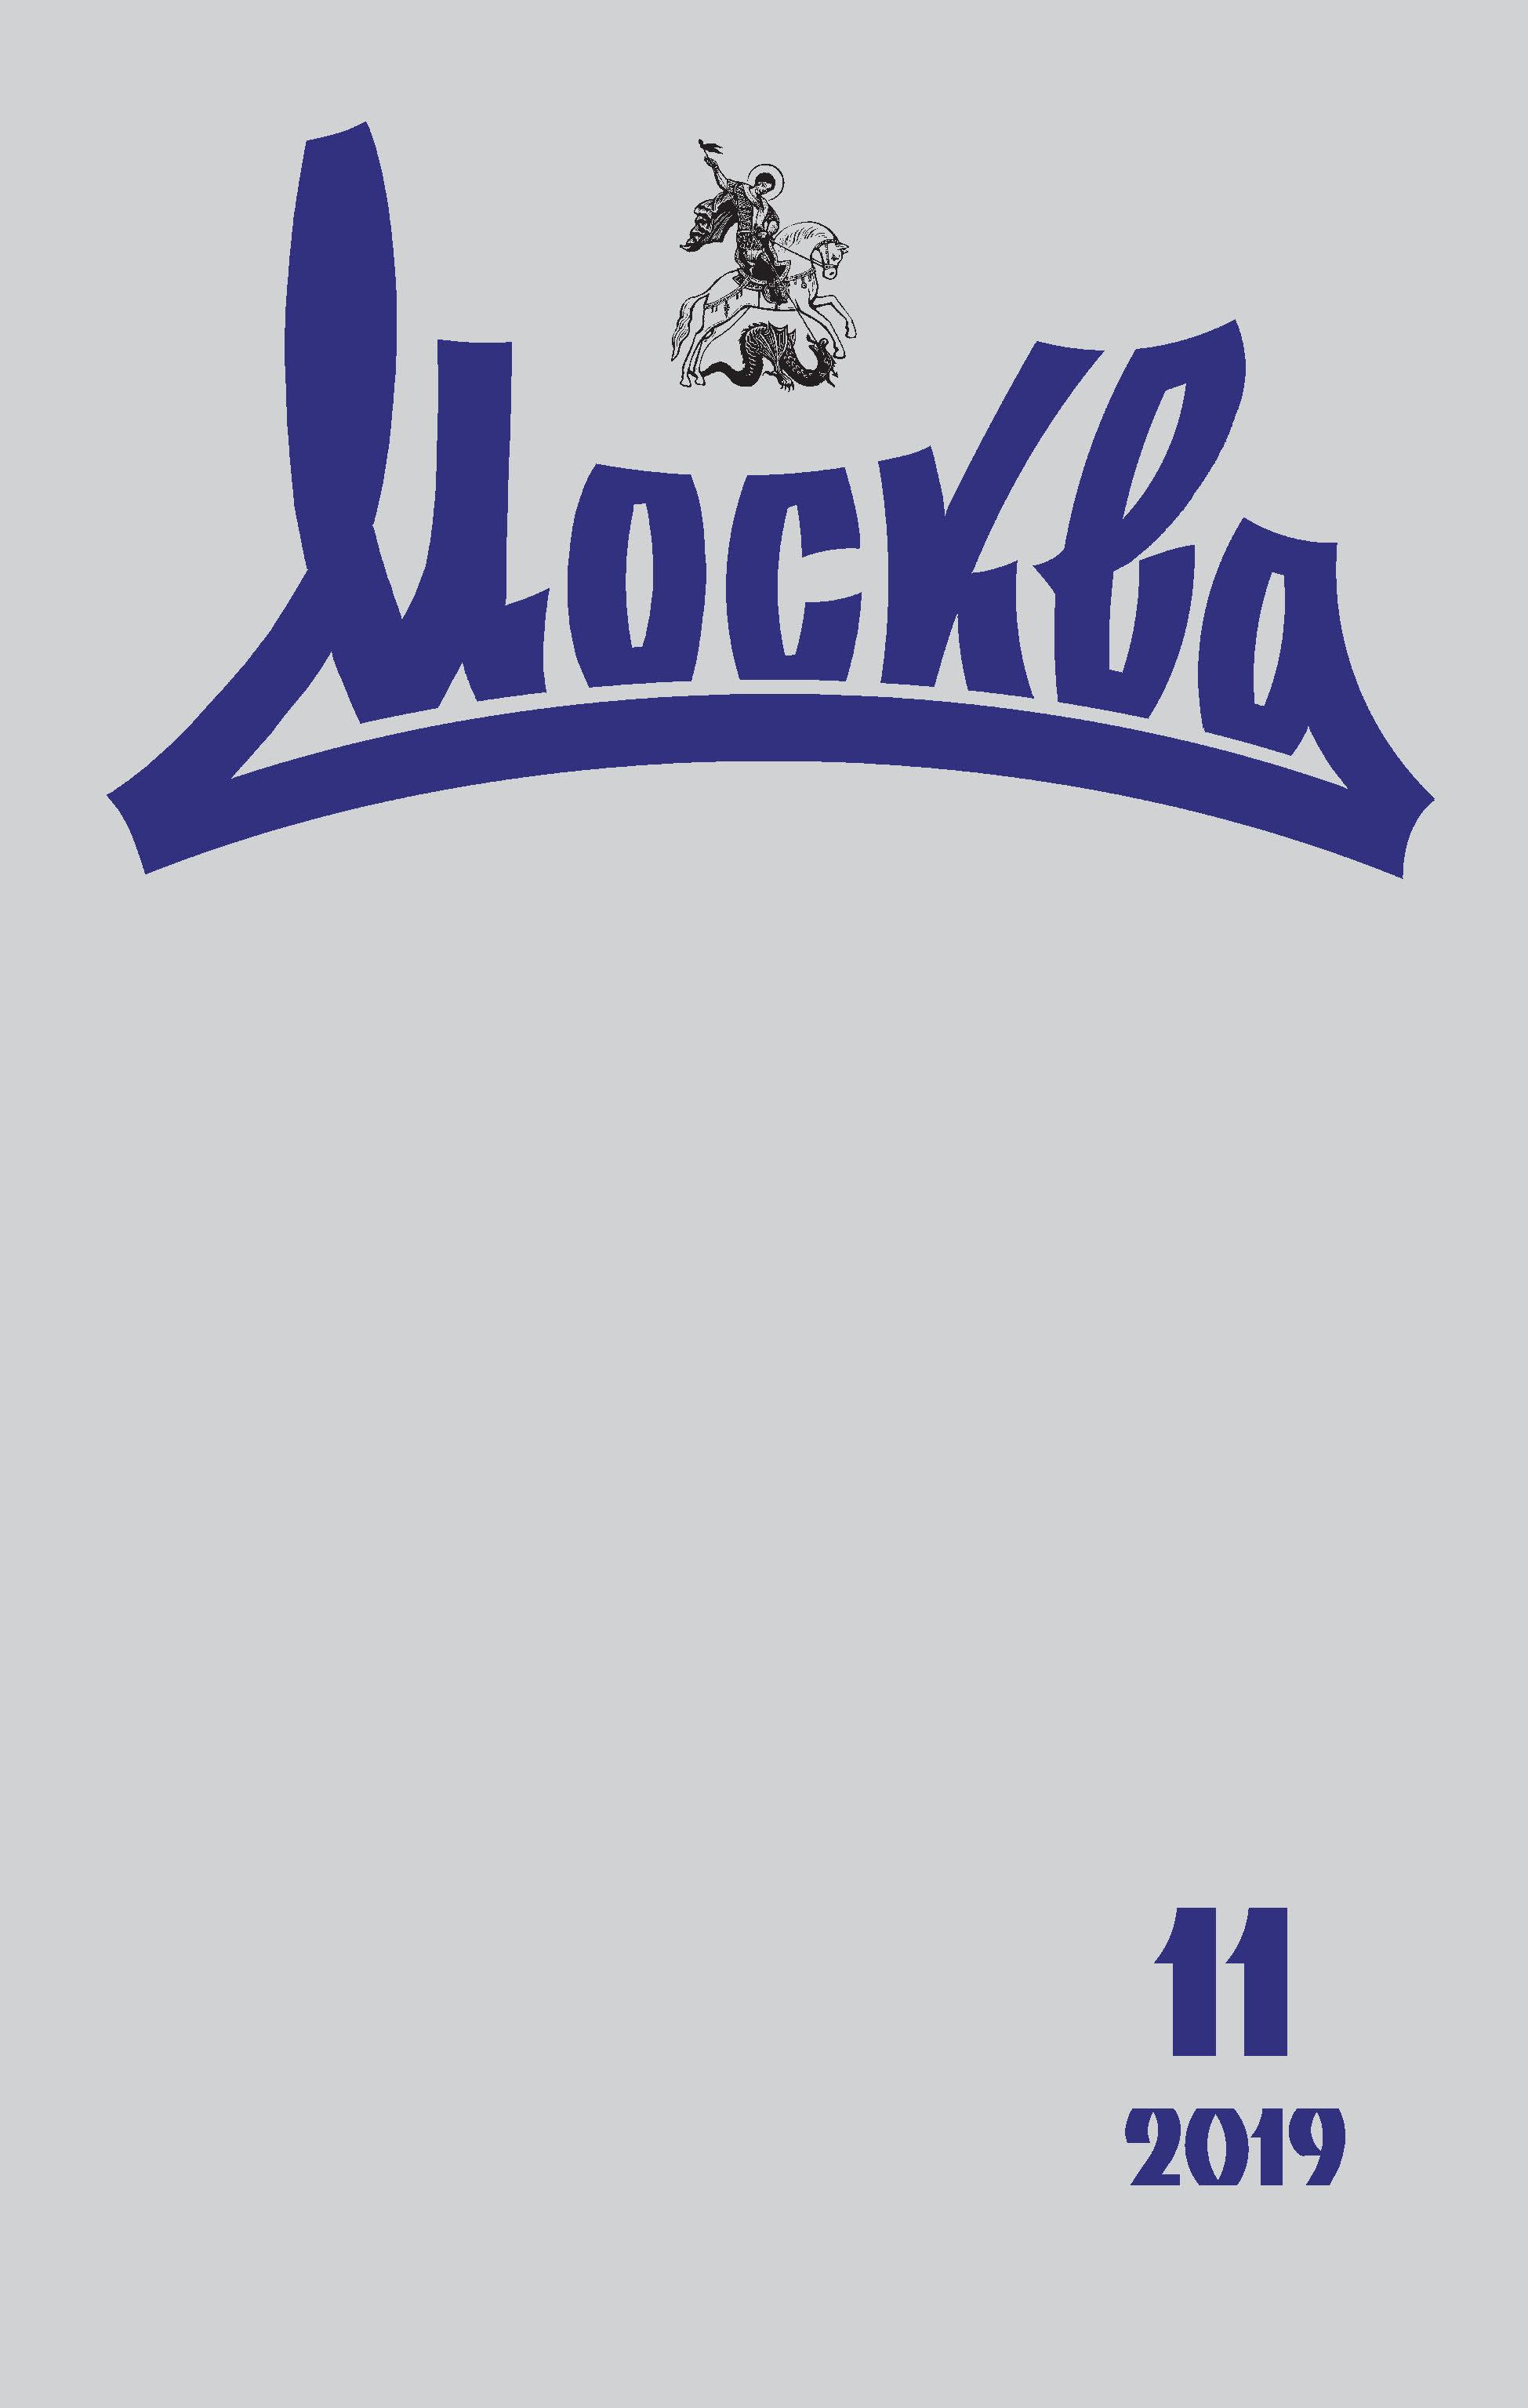 Журнал русской культуры «Москва» №11/2019